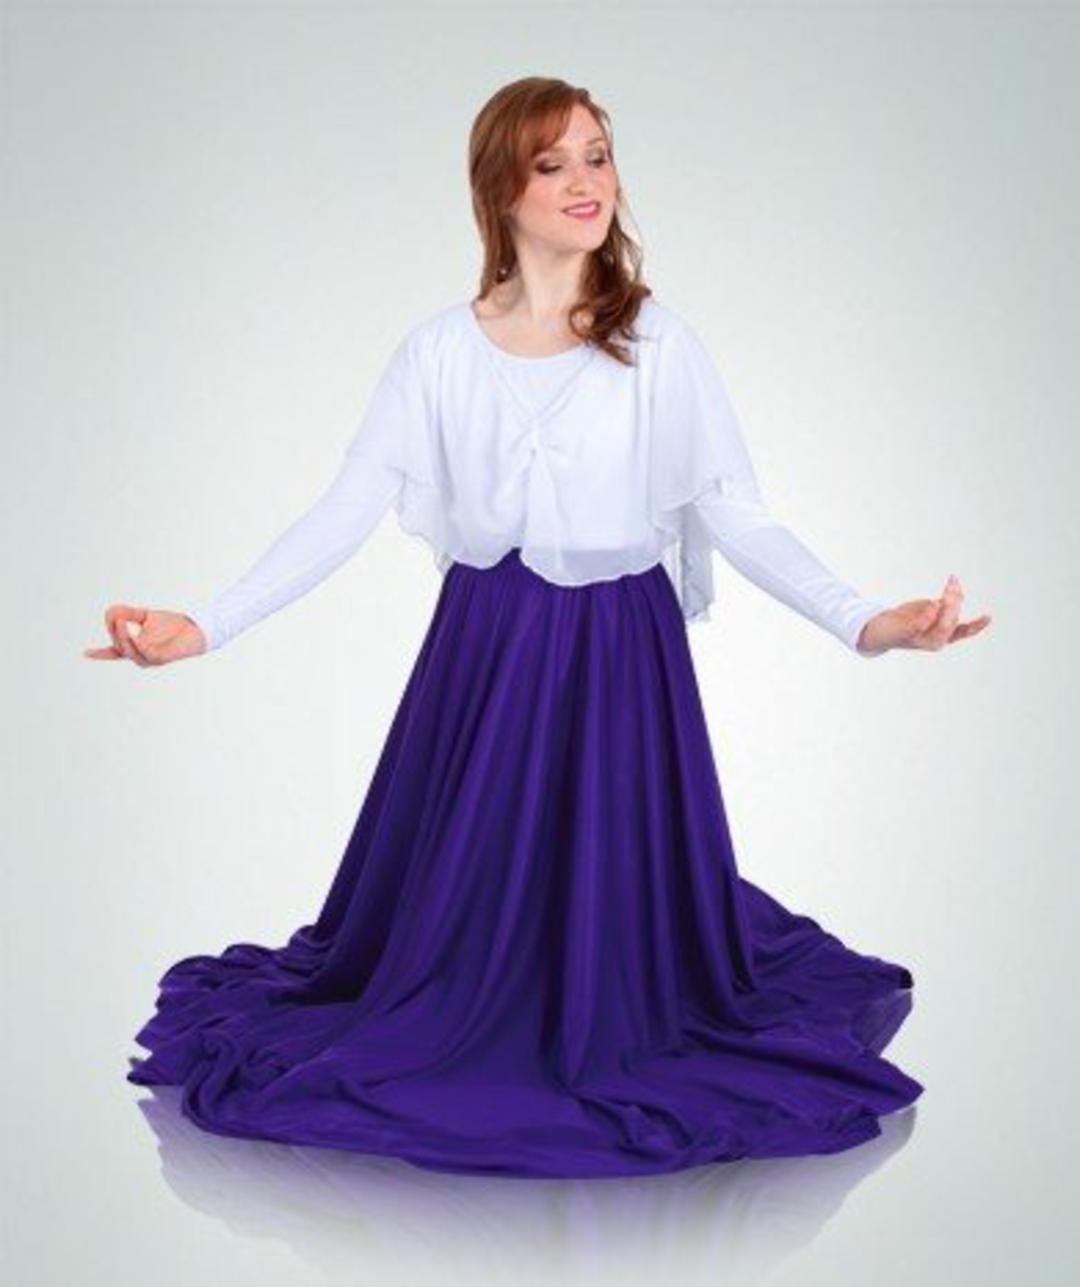 NWT Praisewear Liturgical LongSleeve double skirt floor length dress Plum red